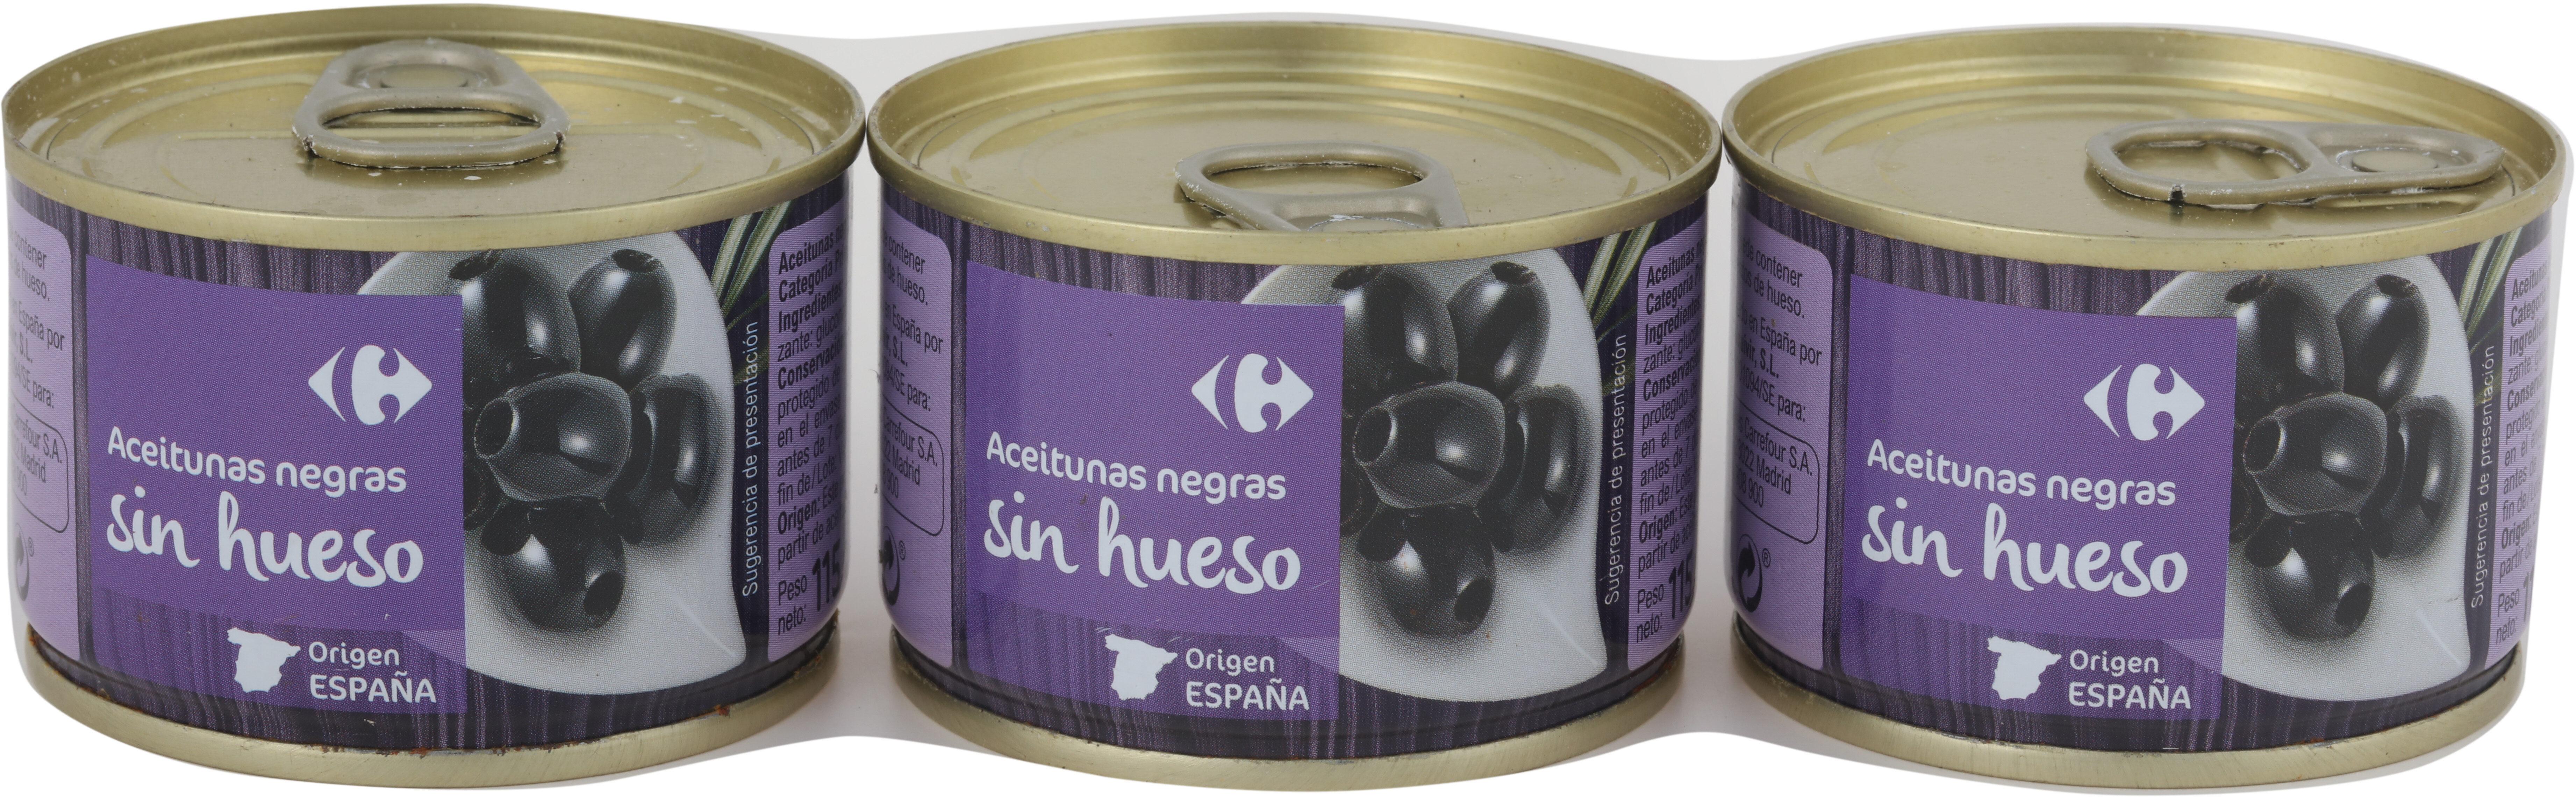 Aceitunas S/Hueso Negra Cac. Lata - Producte - es